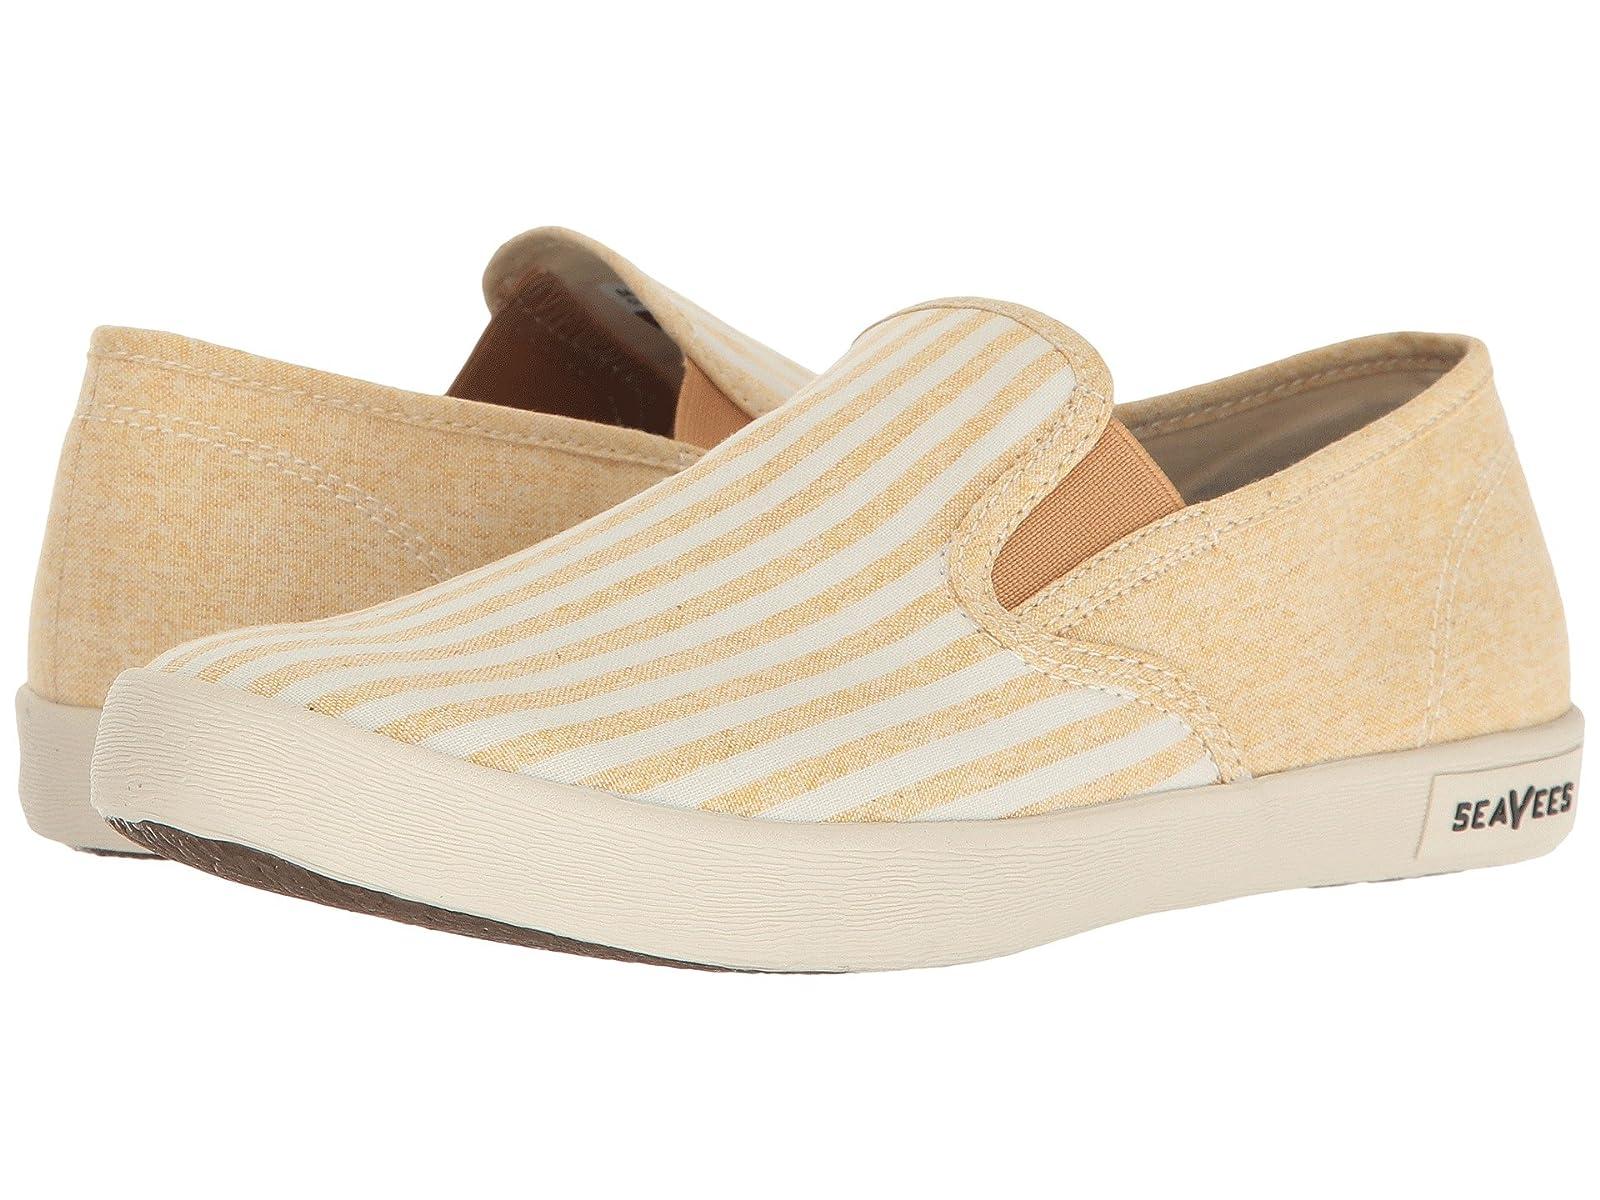 SeaVees 02/64 Baja Beach ClubCheap and distinctive eye-catching shoes